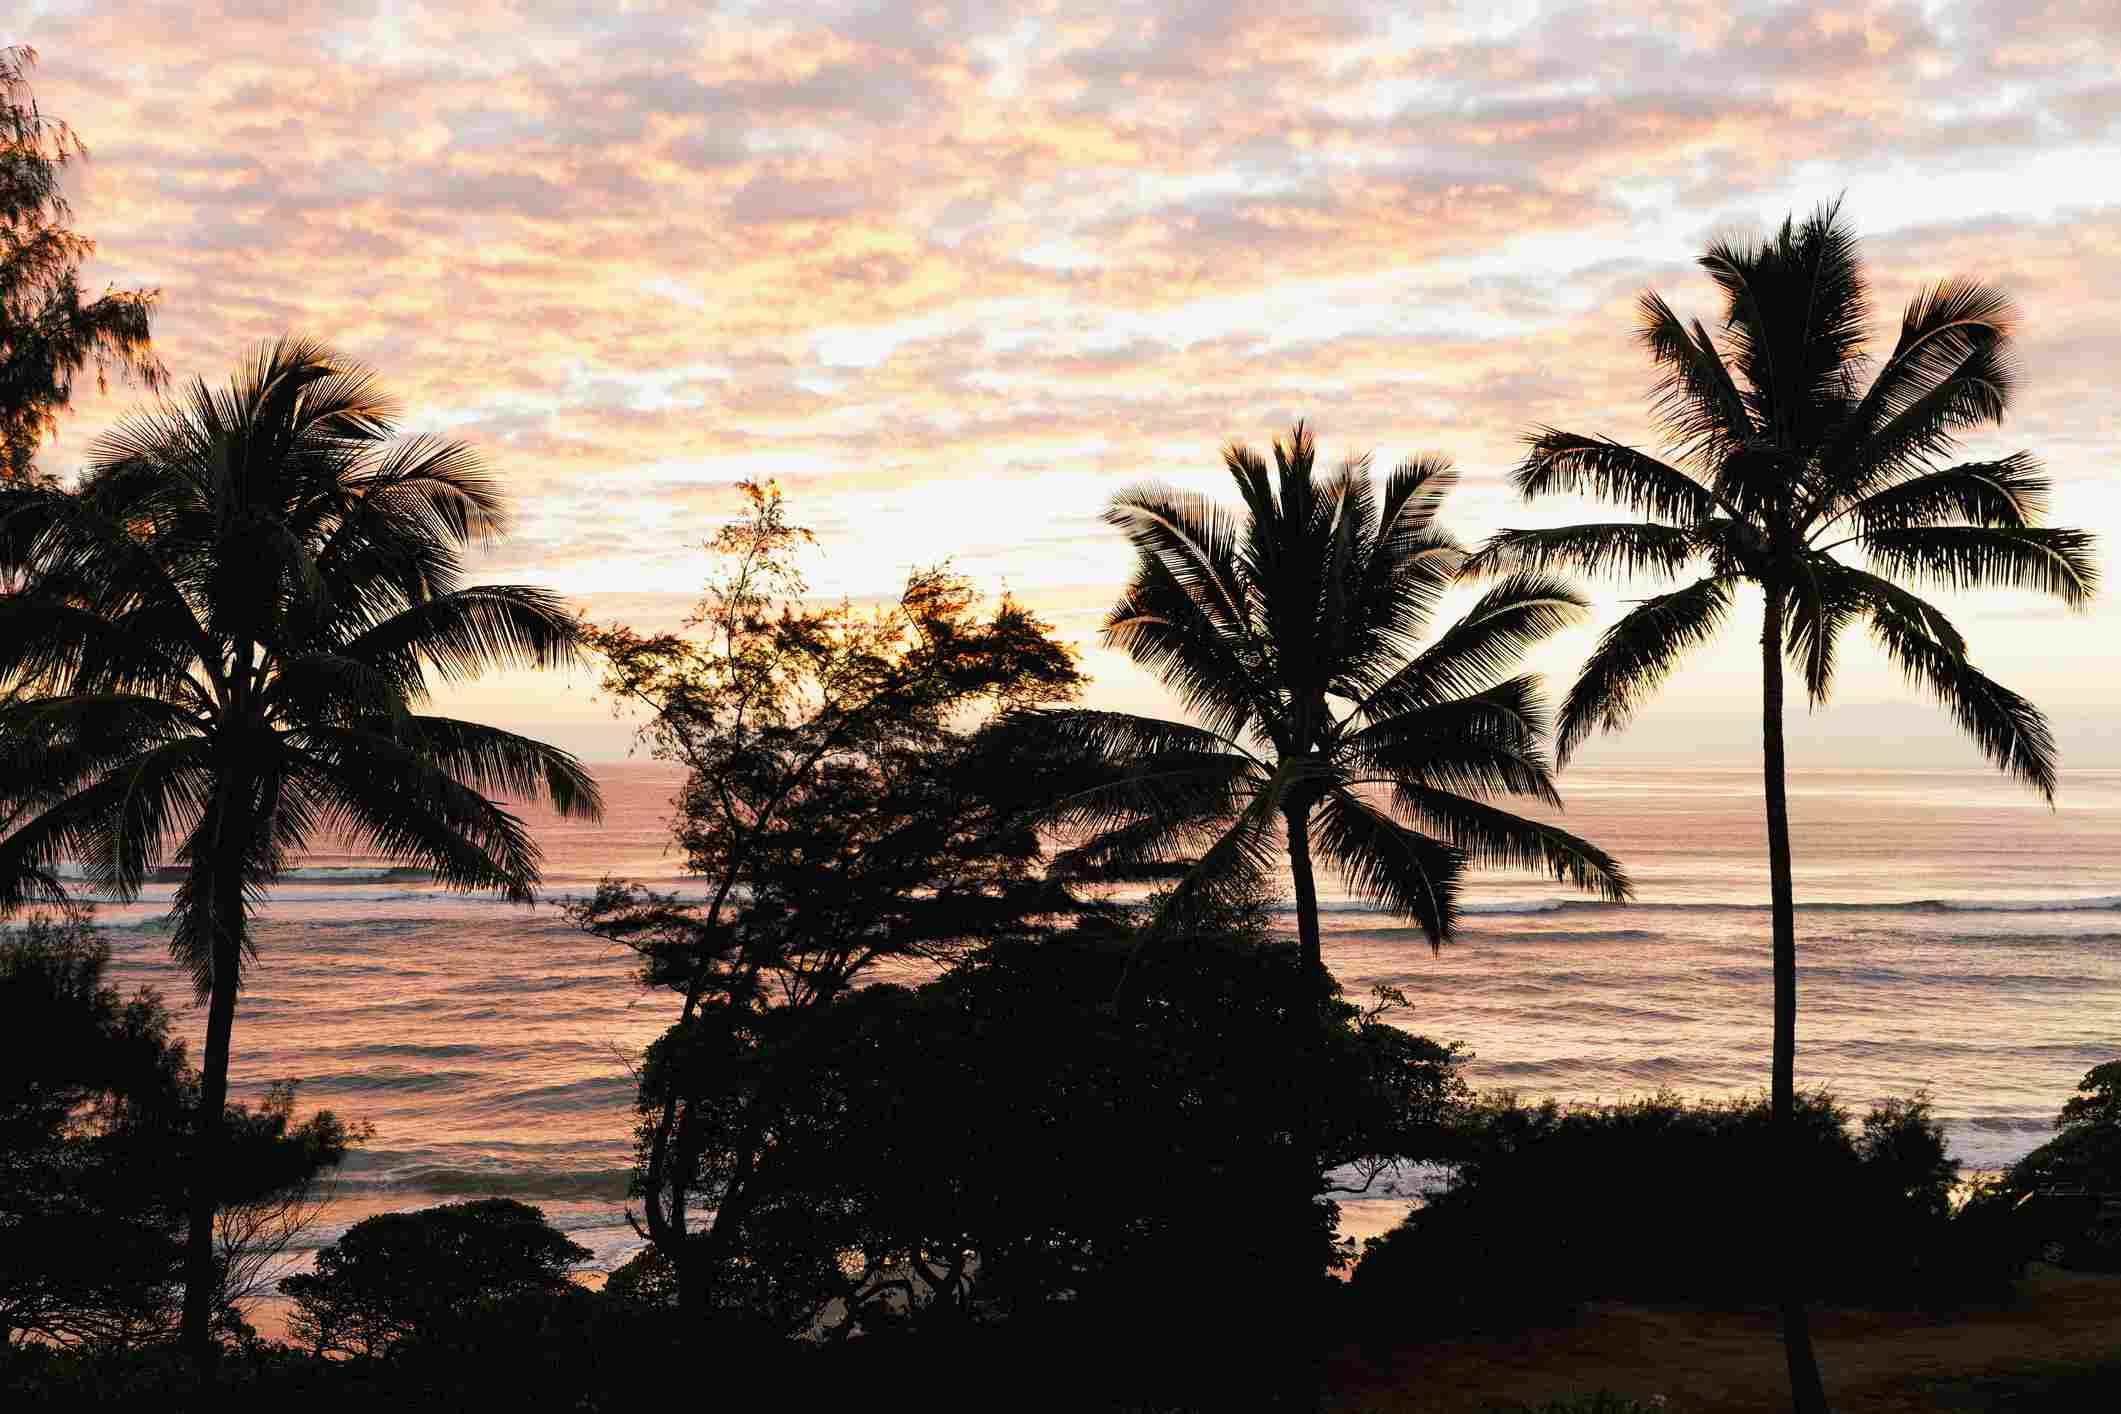 Morning sunrise through the palm trees along Lydgate Beach